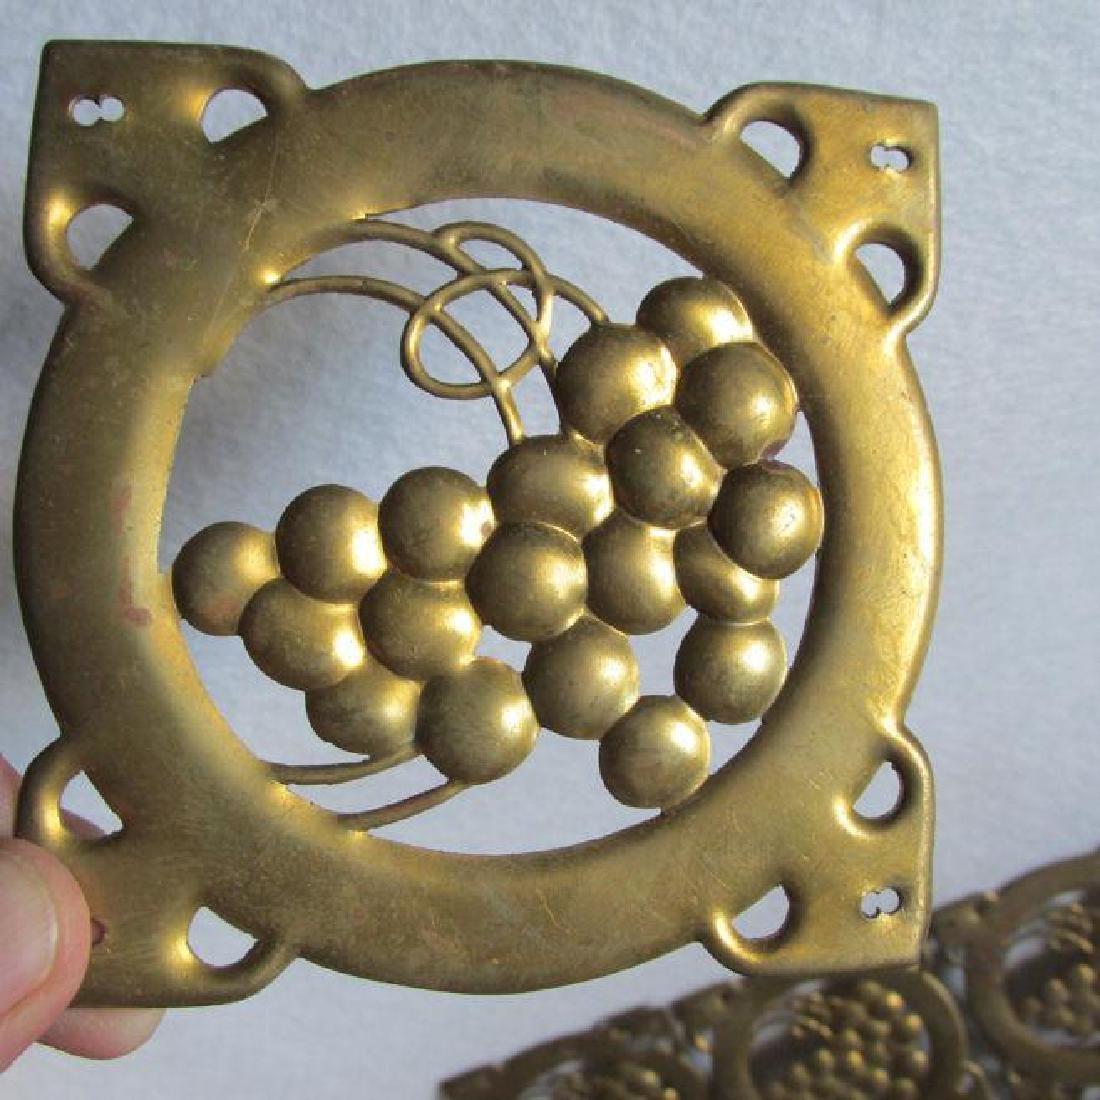 10 Arts & Crafts, Mission Brass Architectural Elements - 2